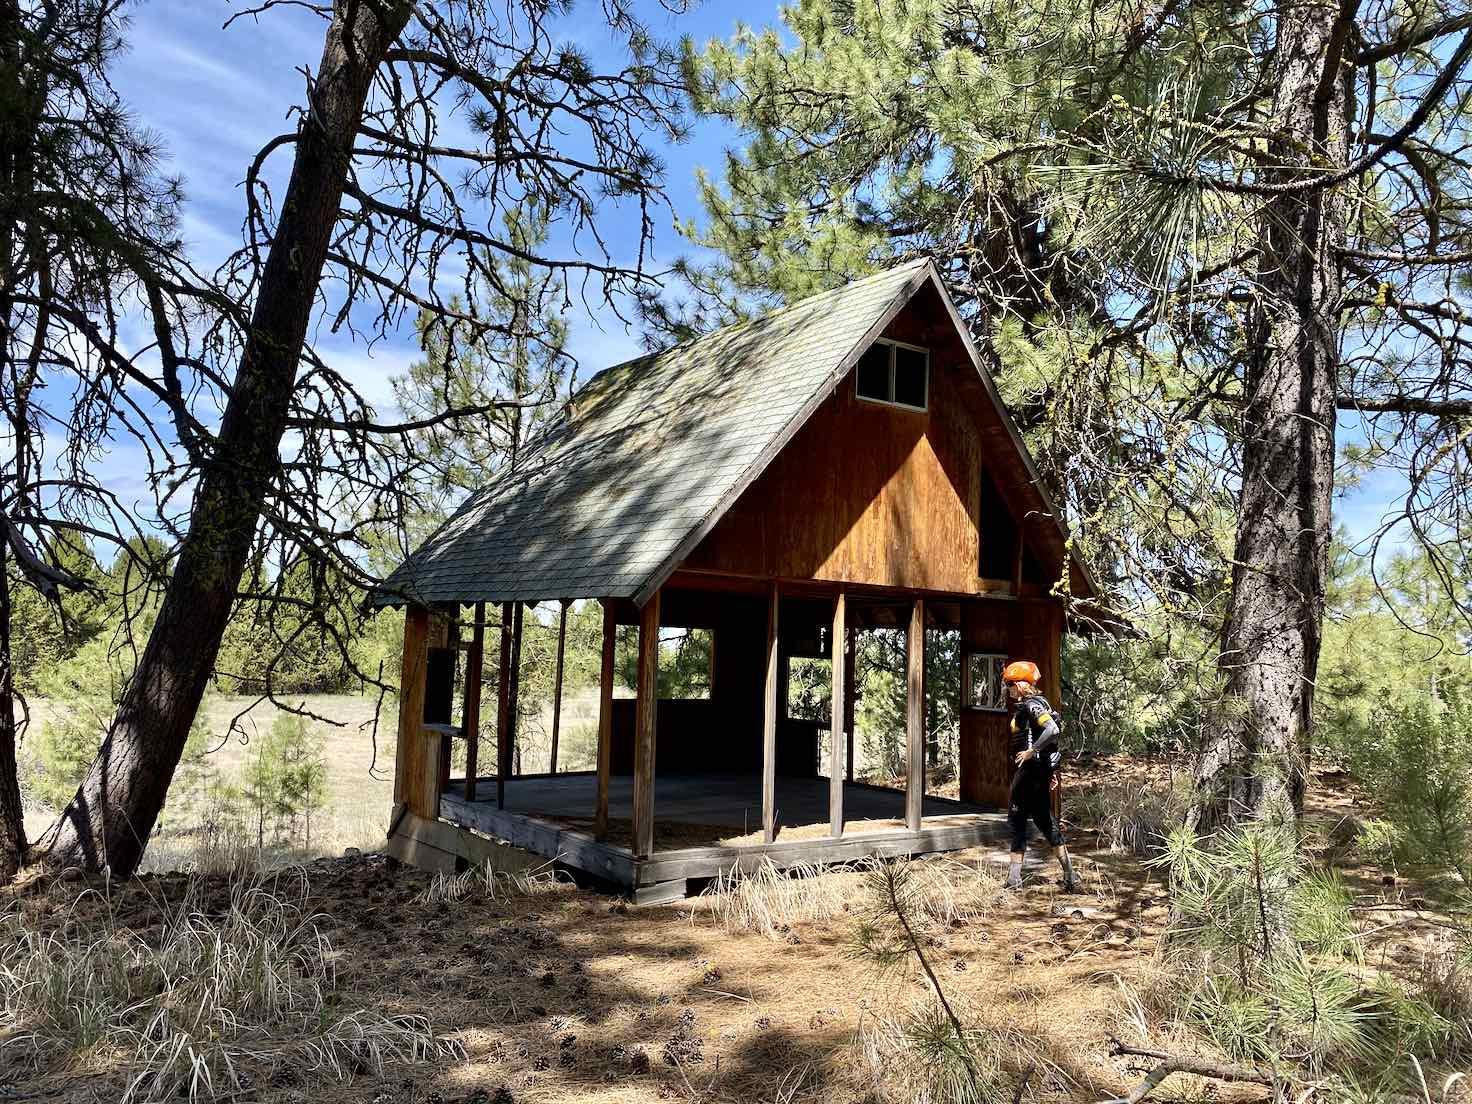 An old hunting shack near the Klamath Marsh.